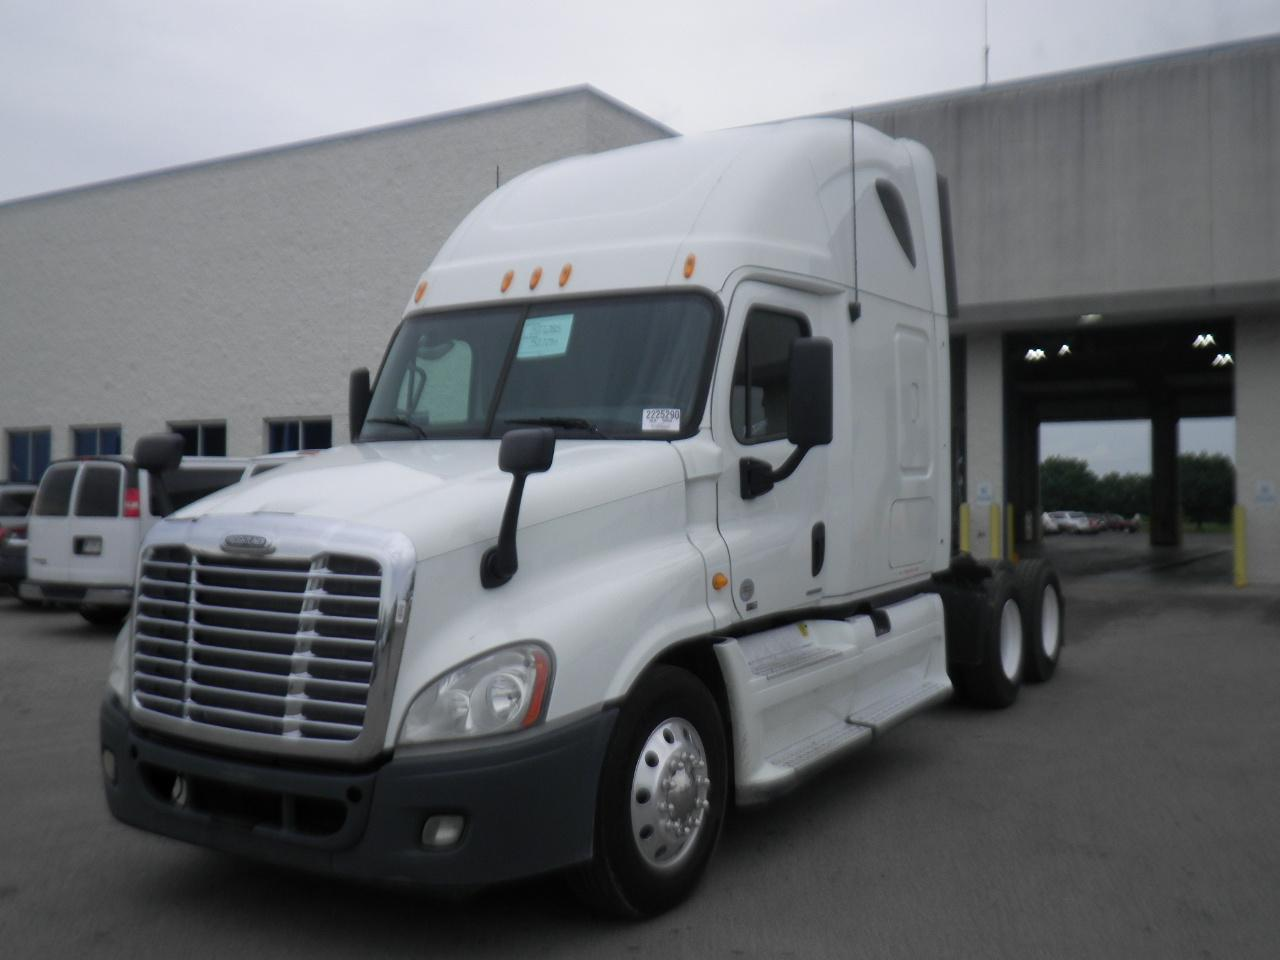 2012 Freightliner Cascadia - Detroit 455hp 10 speed 527k miles